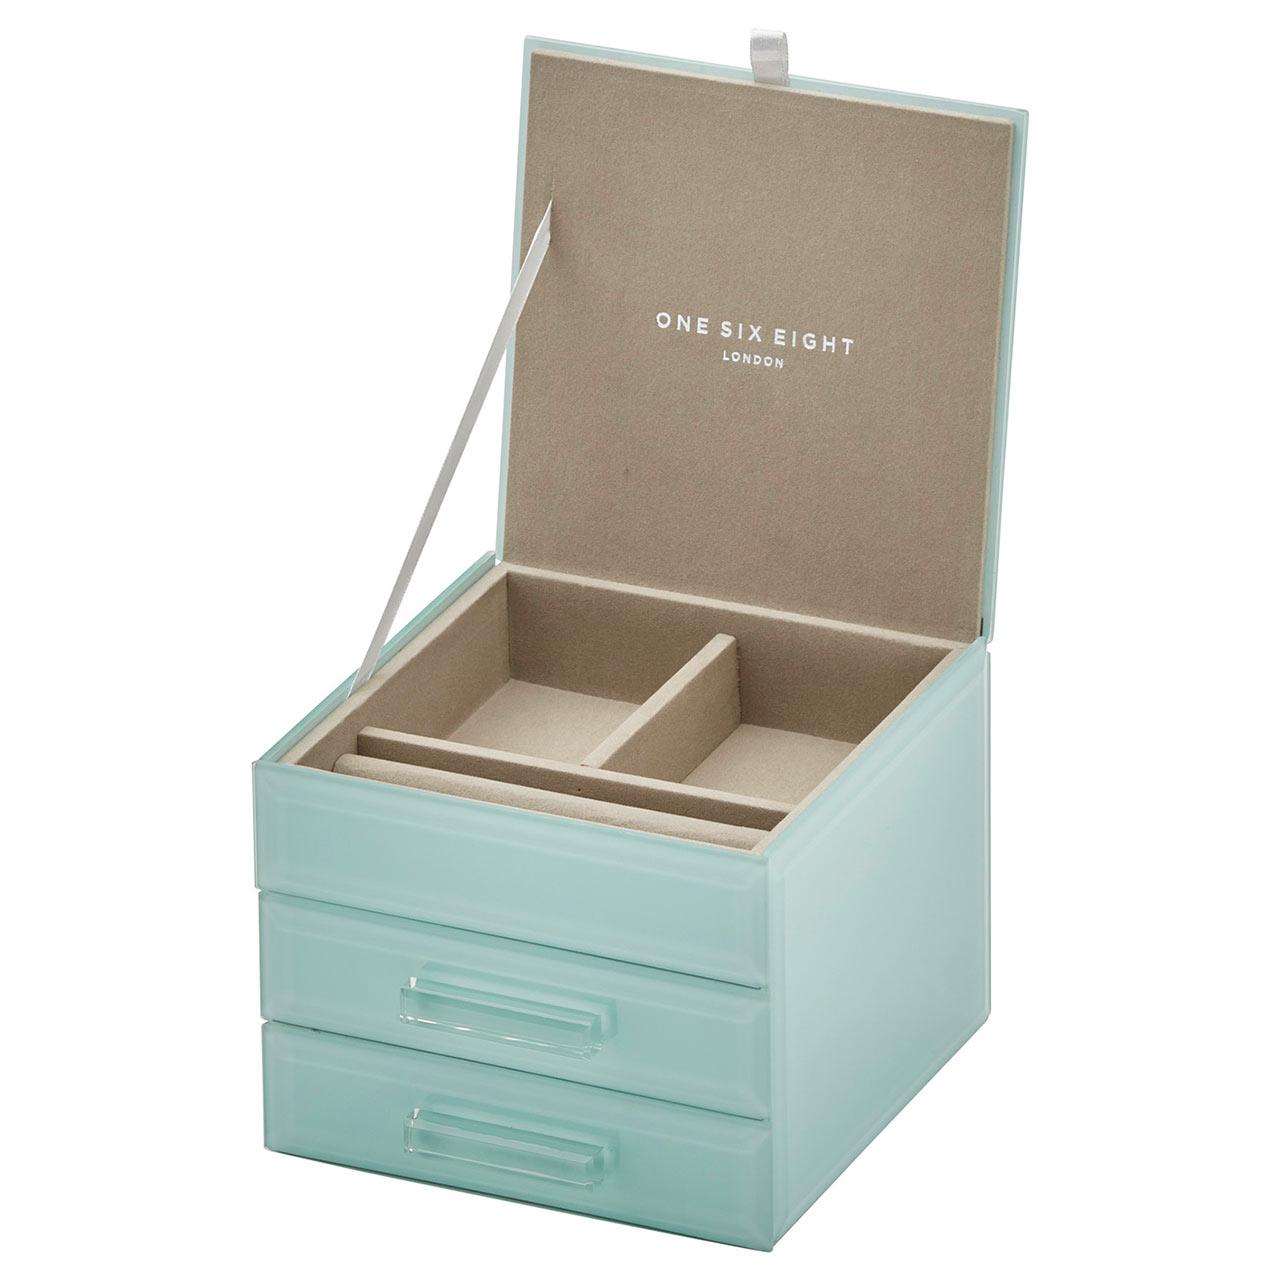 ONE SIX EIGHT LONDON Jewellery Box GABRIELLA Mint | the design gift shop